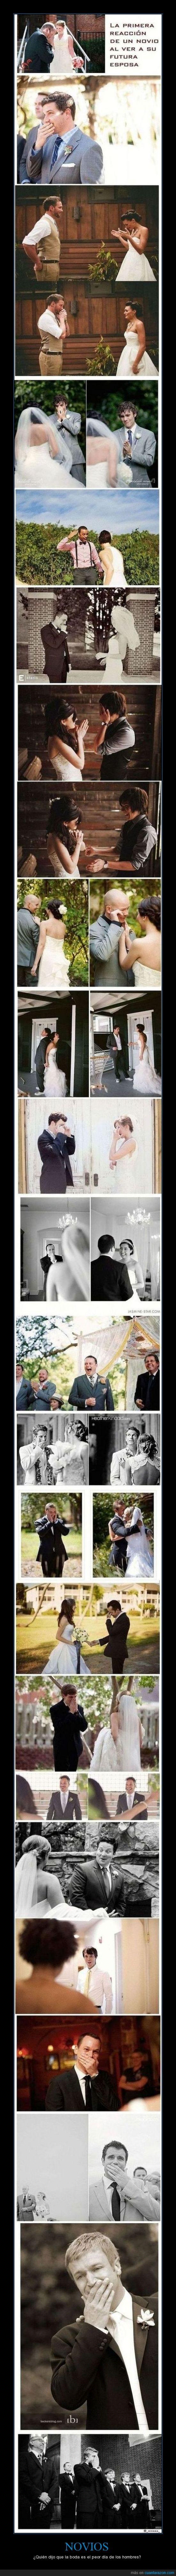 felices,futuras esposas,futuros esposos,lloran,primera reaccion